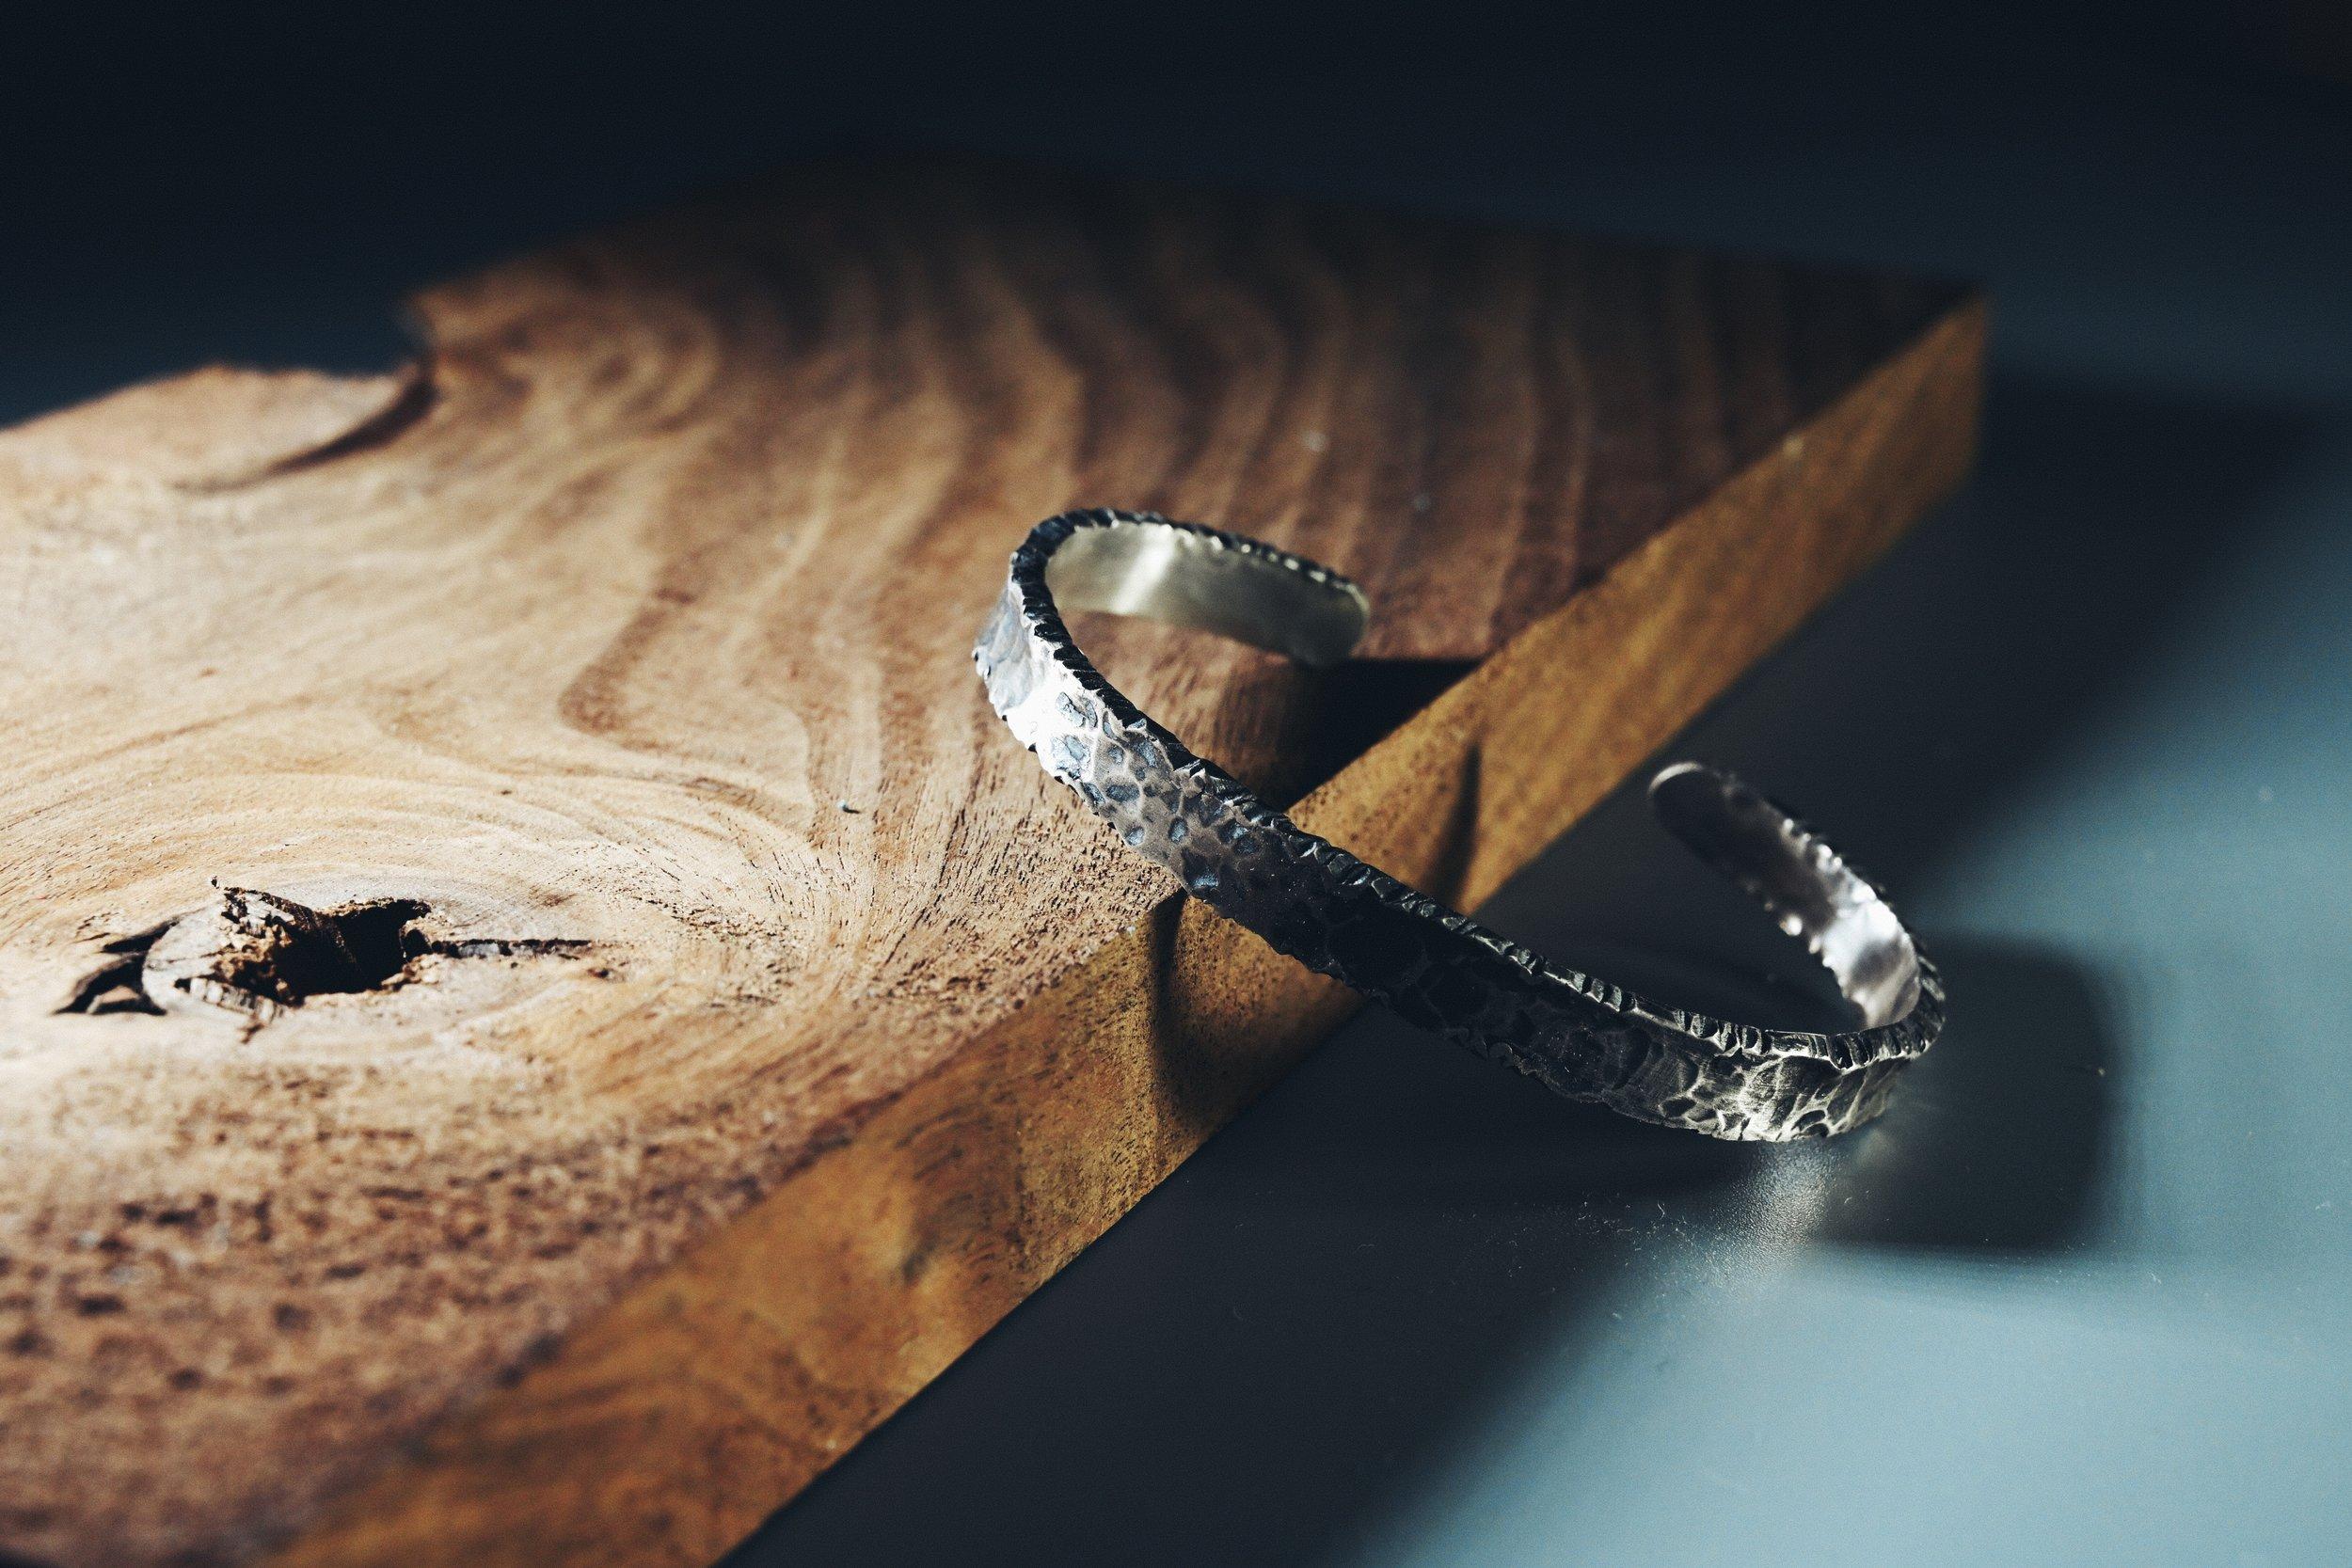 3hrs 金工體驗班Jewelry Making Experience - 適合新手/自稱手殘者這是專為想輕鬆體驗首飾製作(傳統金工)而設計的課程,參加者還可親身嘗試專業焊接的有趣過程~可造類別:戒指 / 手鐲 / 耳環 / 吊咀 / 呔夾 / 袖口鈕 / 錢夾成品即日拎走